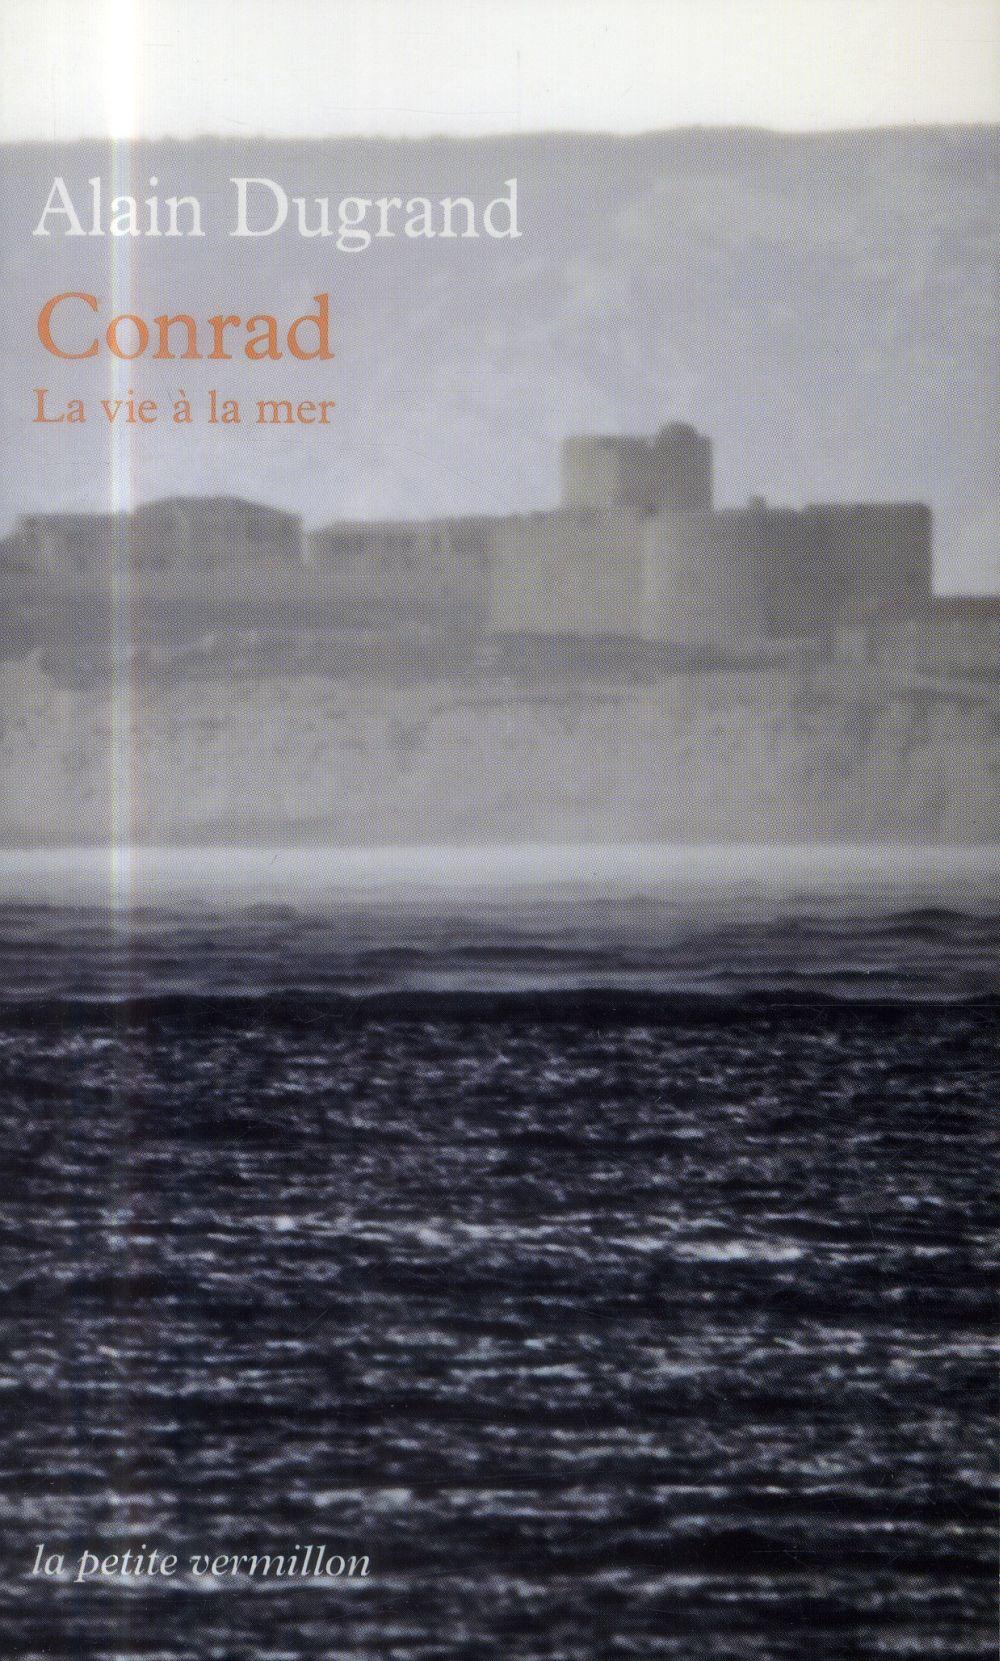 Conrad, la vie à la mer